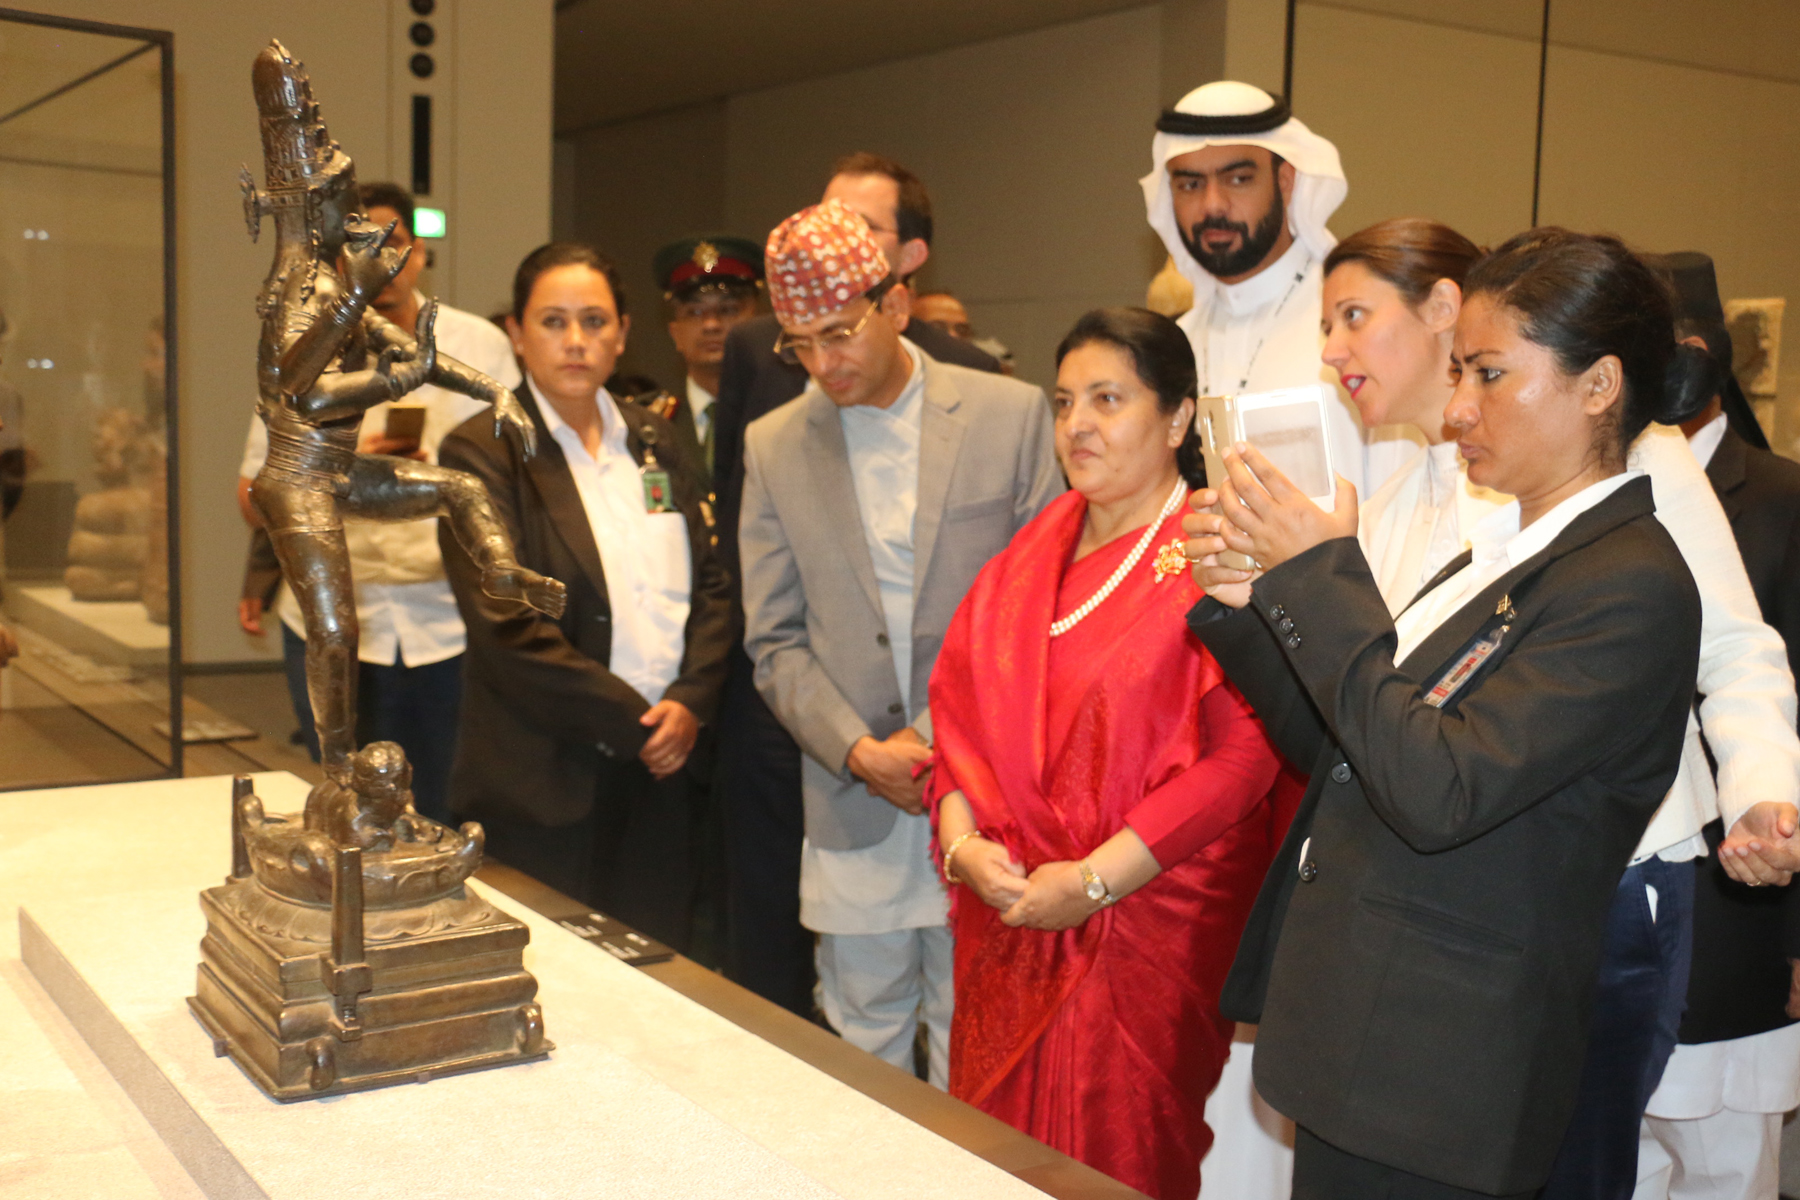 President Bhandari observes Louvre Abu Dhabi and Grand